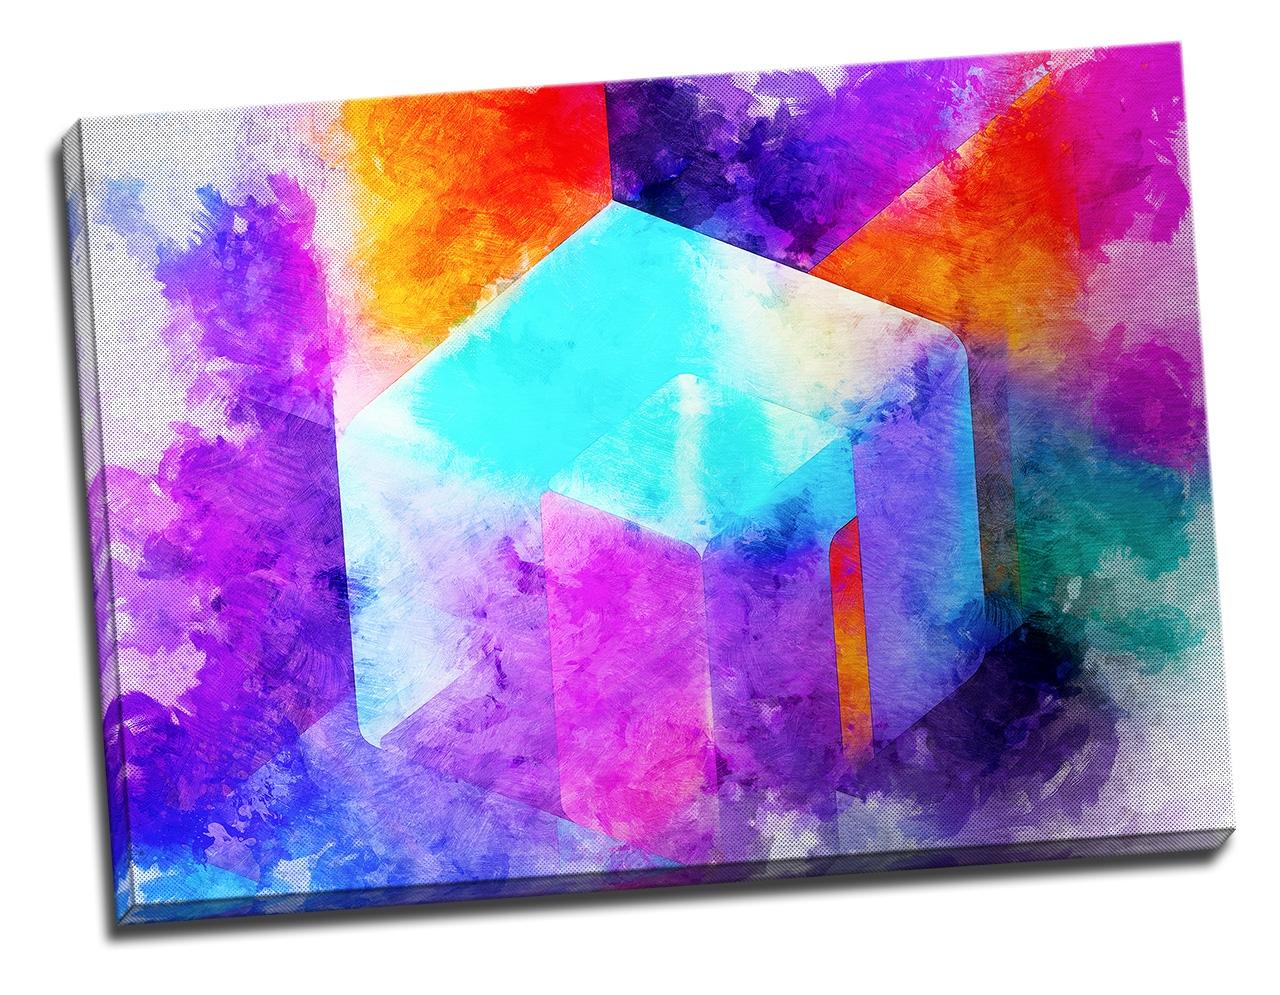 Tablou din aluminiu striat Geometrical Rainbow